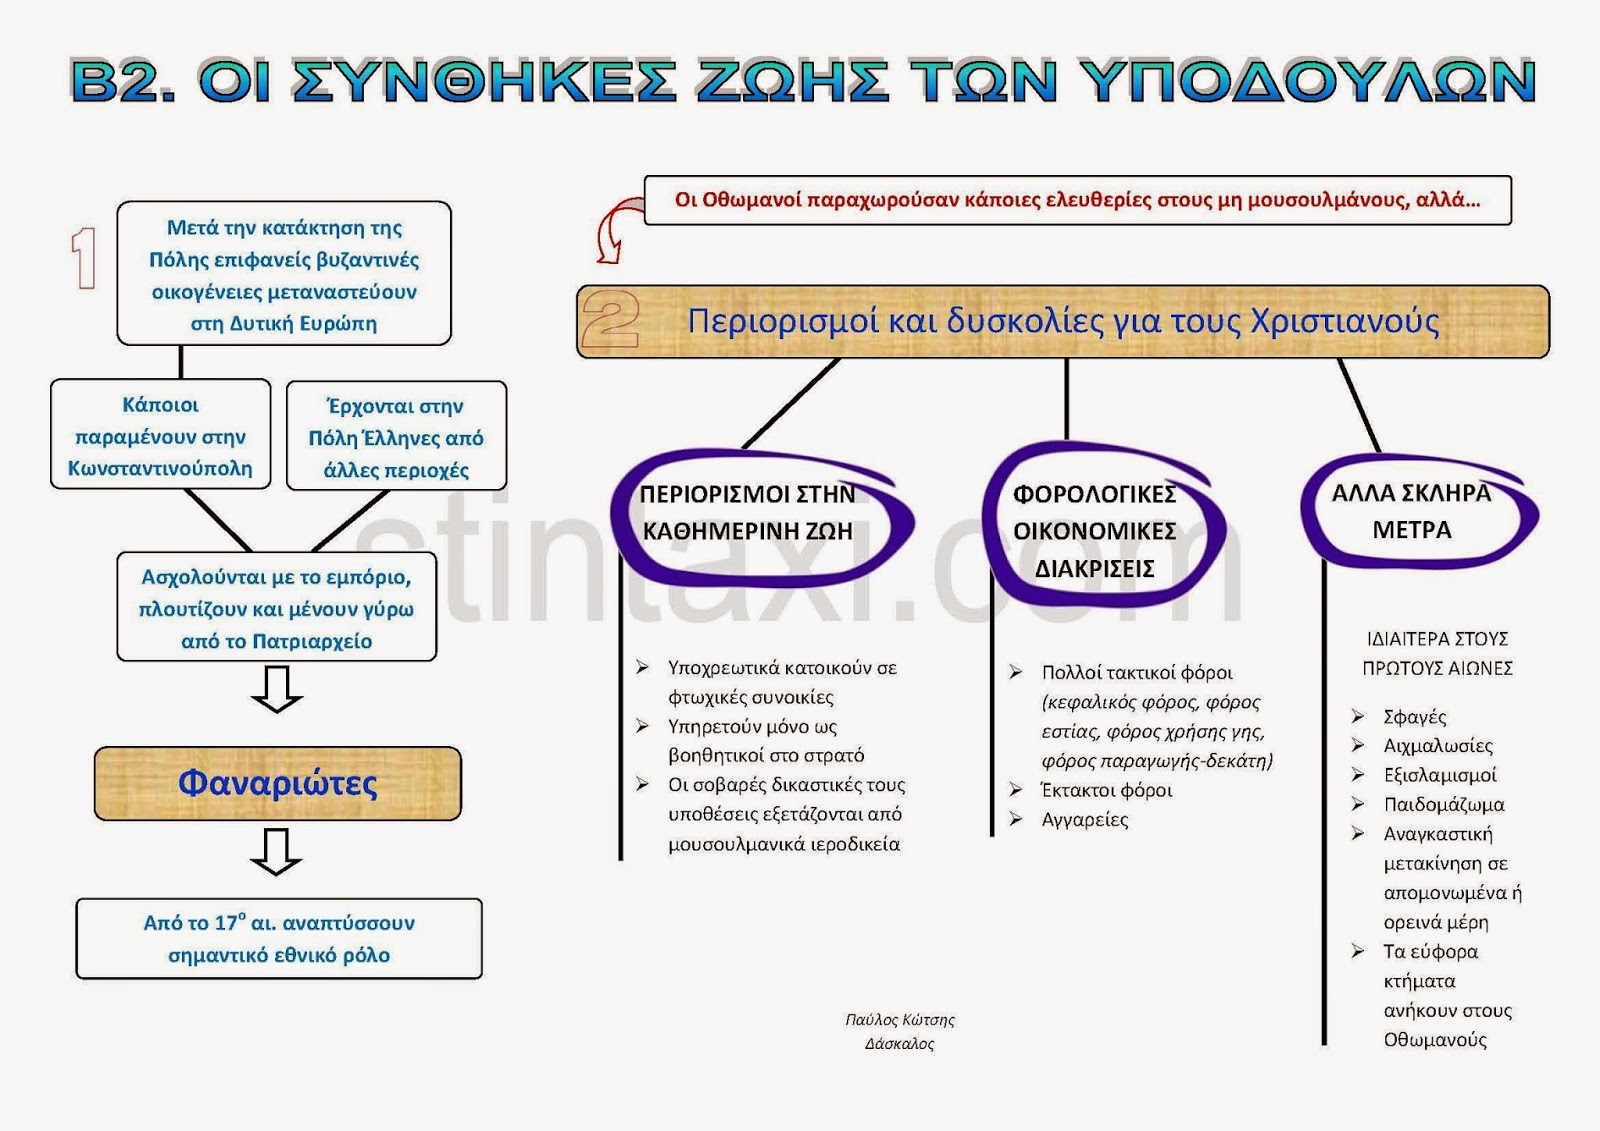 http://www.stintaxi.com/uploads/1/3/1/0/13100858/b2-sinthikes-zois-v2.1.pdf